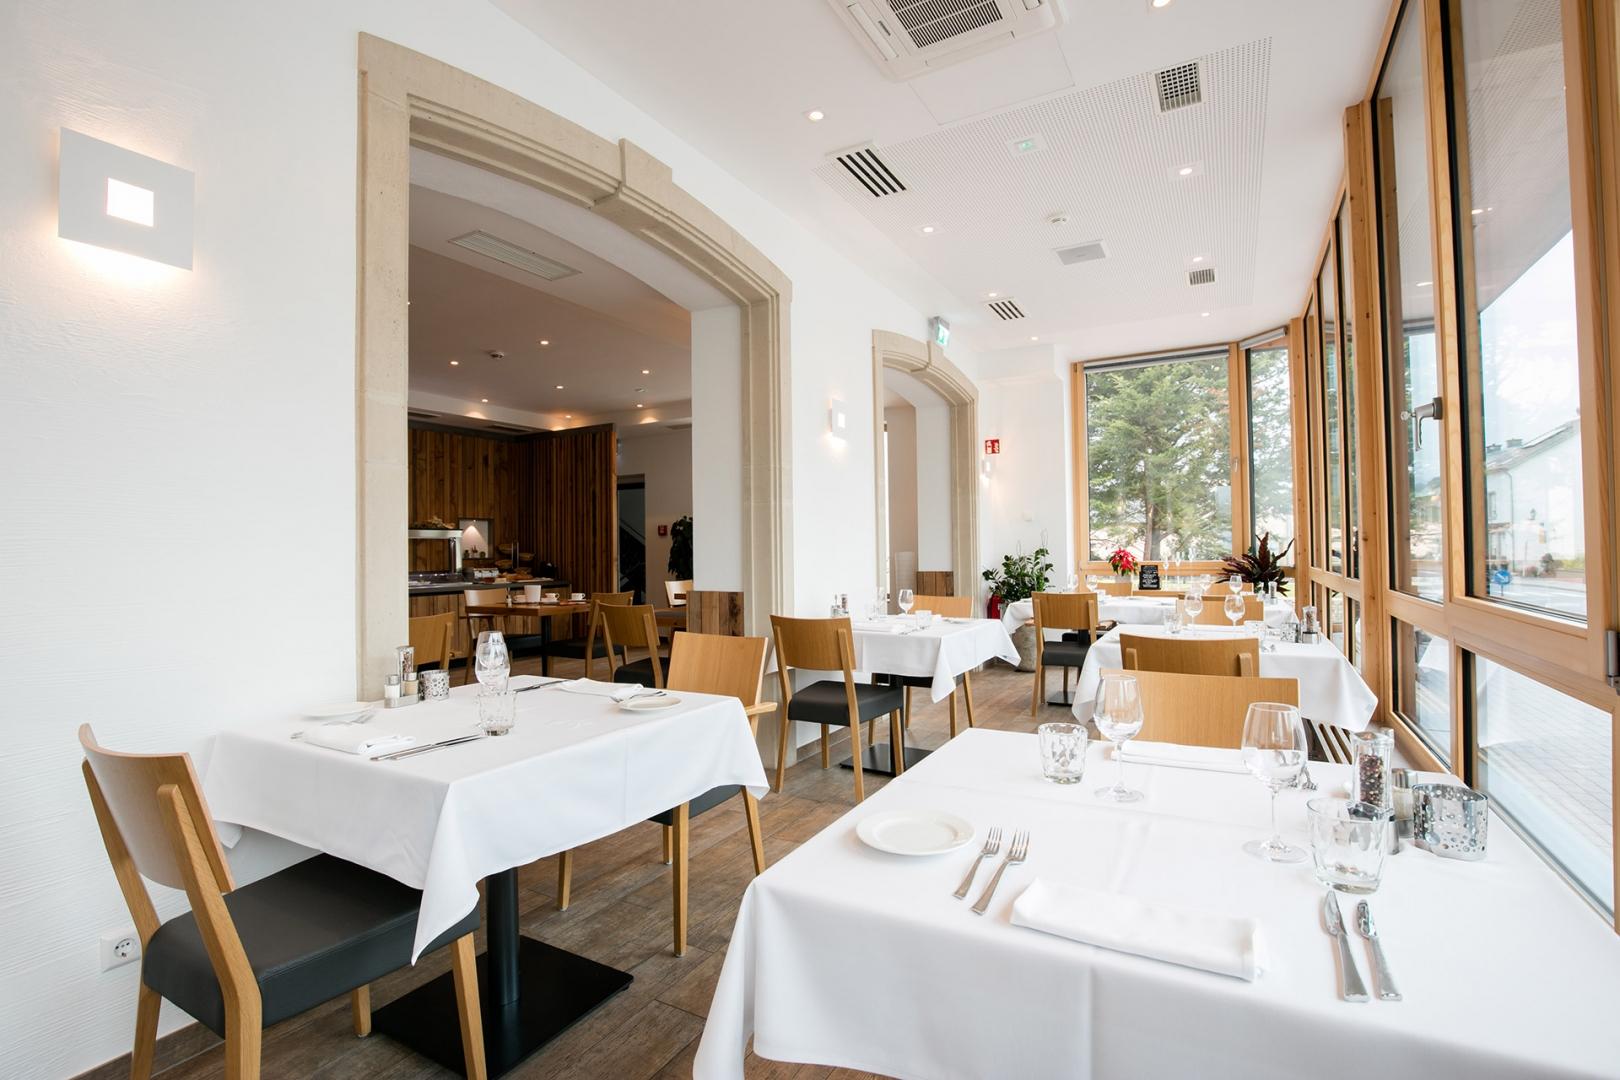 Restaurant terrace restaurant bettendorf for Terrace restaurant menu